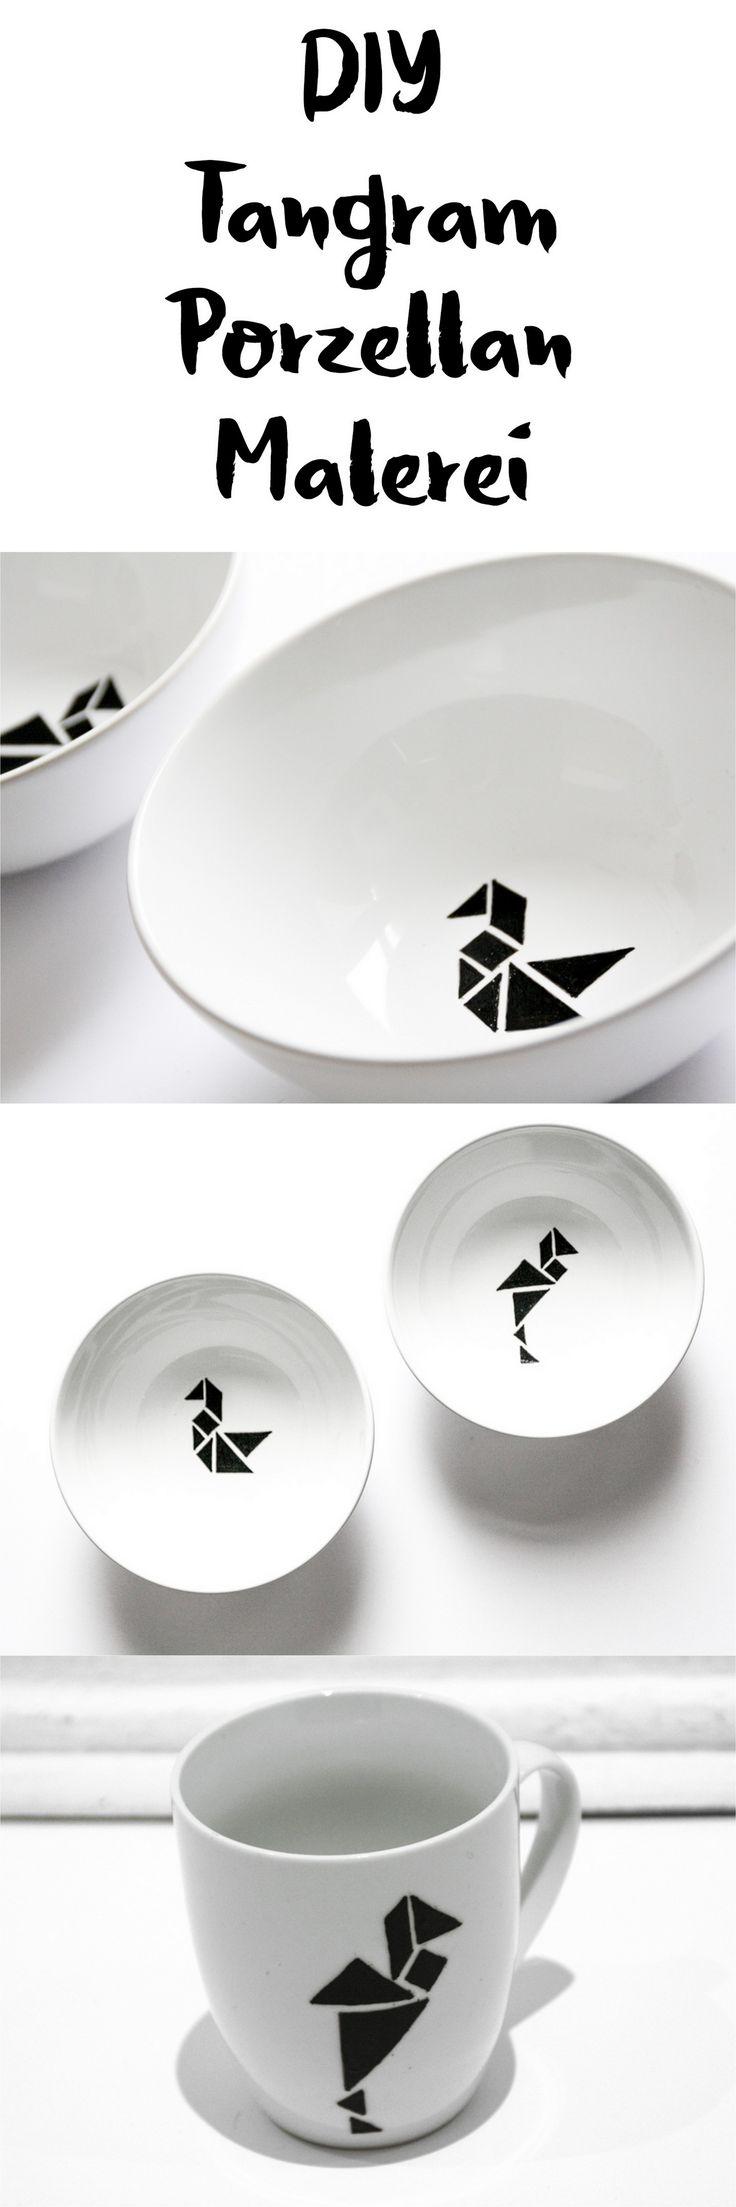 DIY Porzellan bemalen mit Tangram Geschenkidee || DIY porcelain painting with tangram || black and white || Scandinavian Design